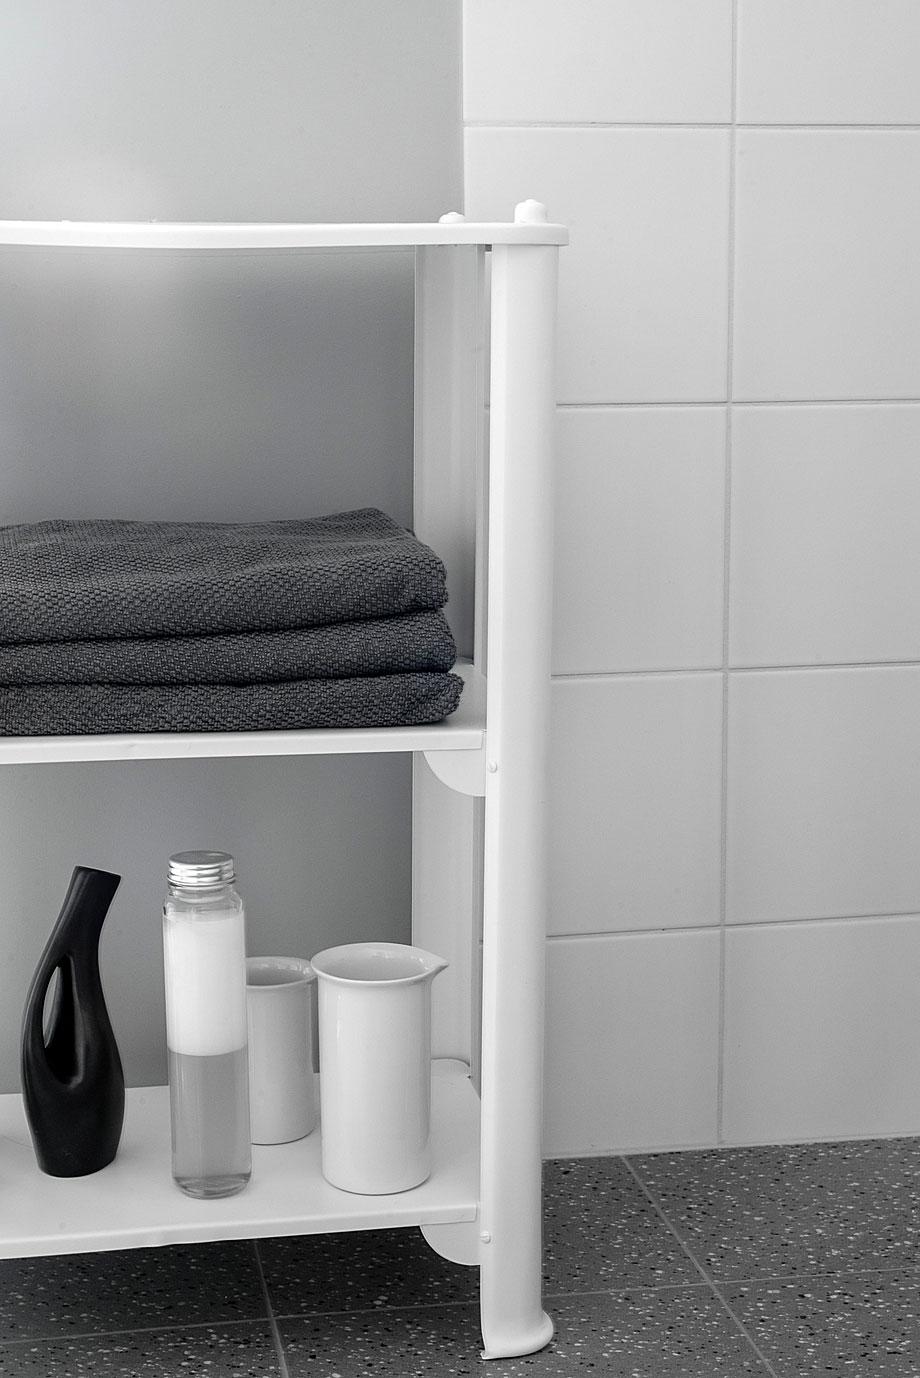 apartamento-tenement-loft-kolasinski (24)